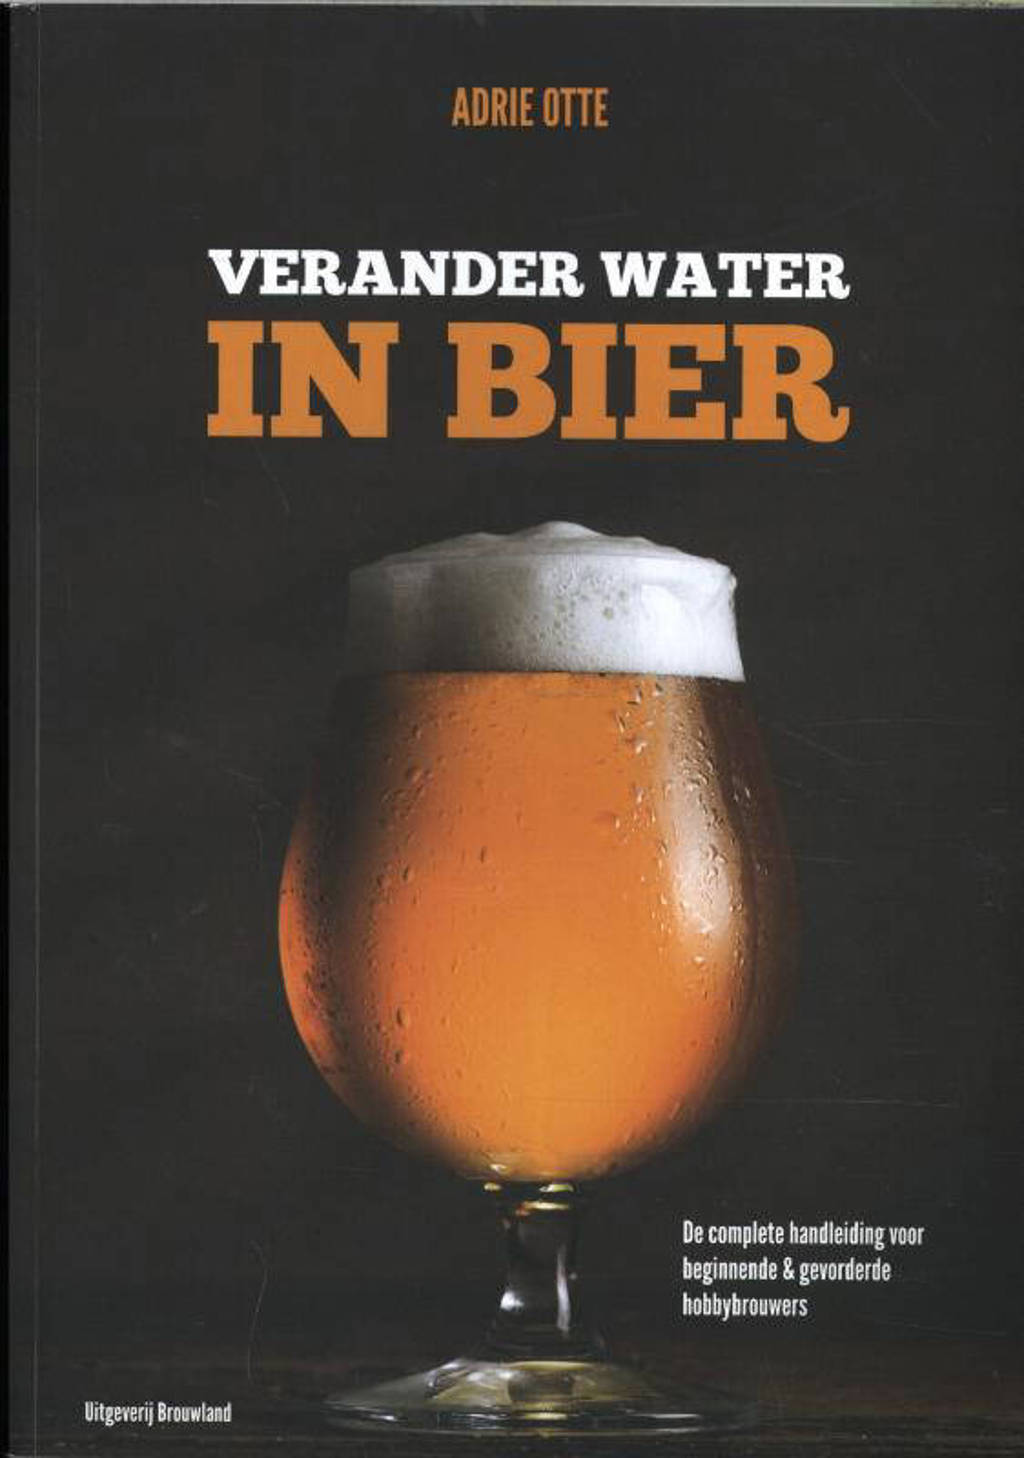 Verander water in bier - Adrie Otte